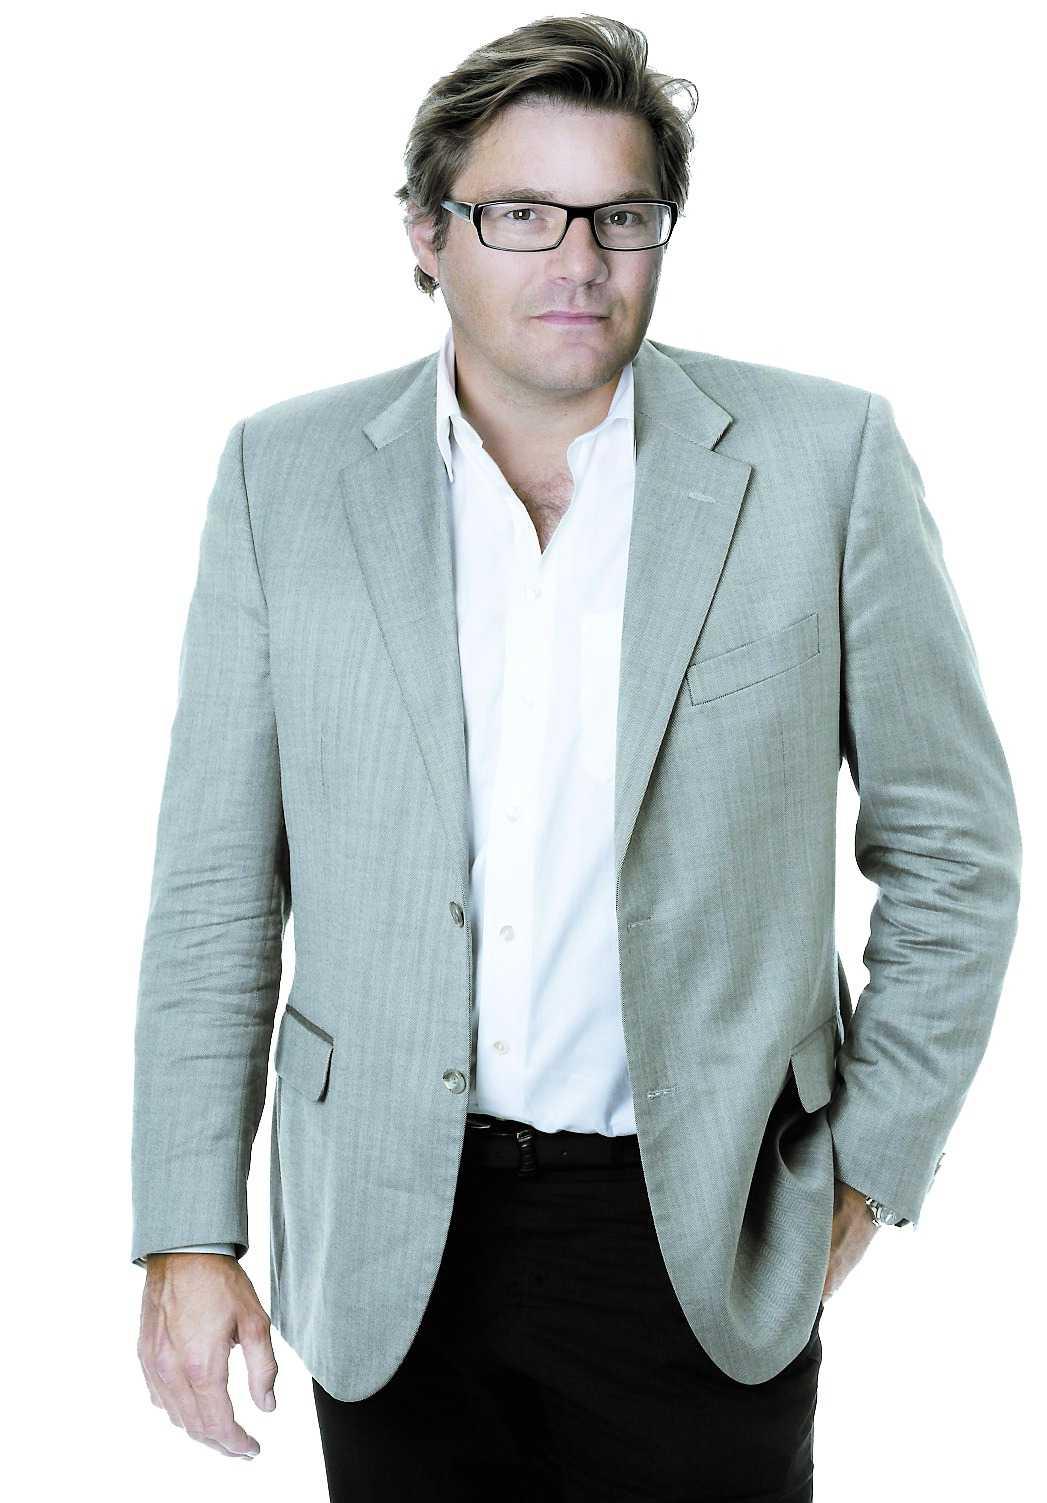 Aftonbladets chefredaktör Jan Helin.